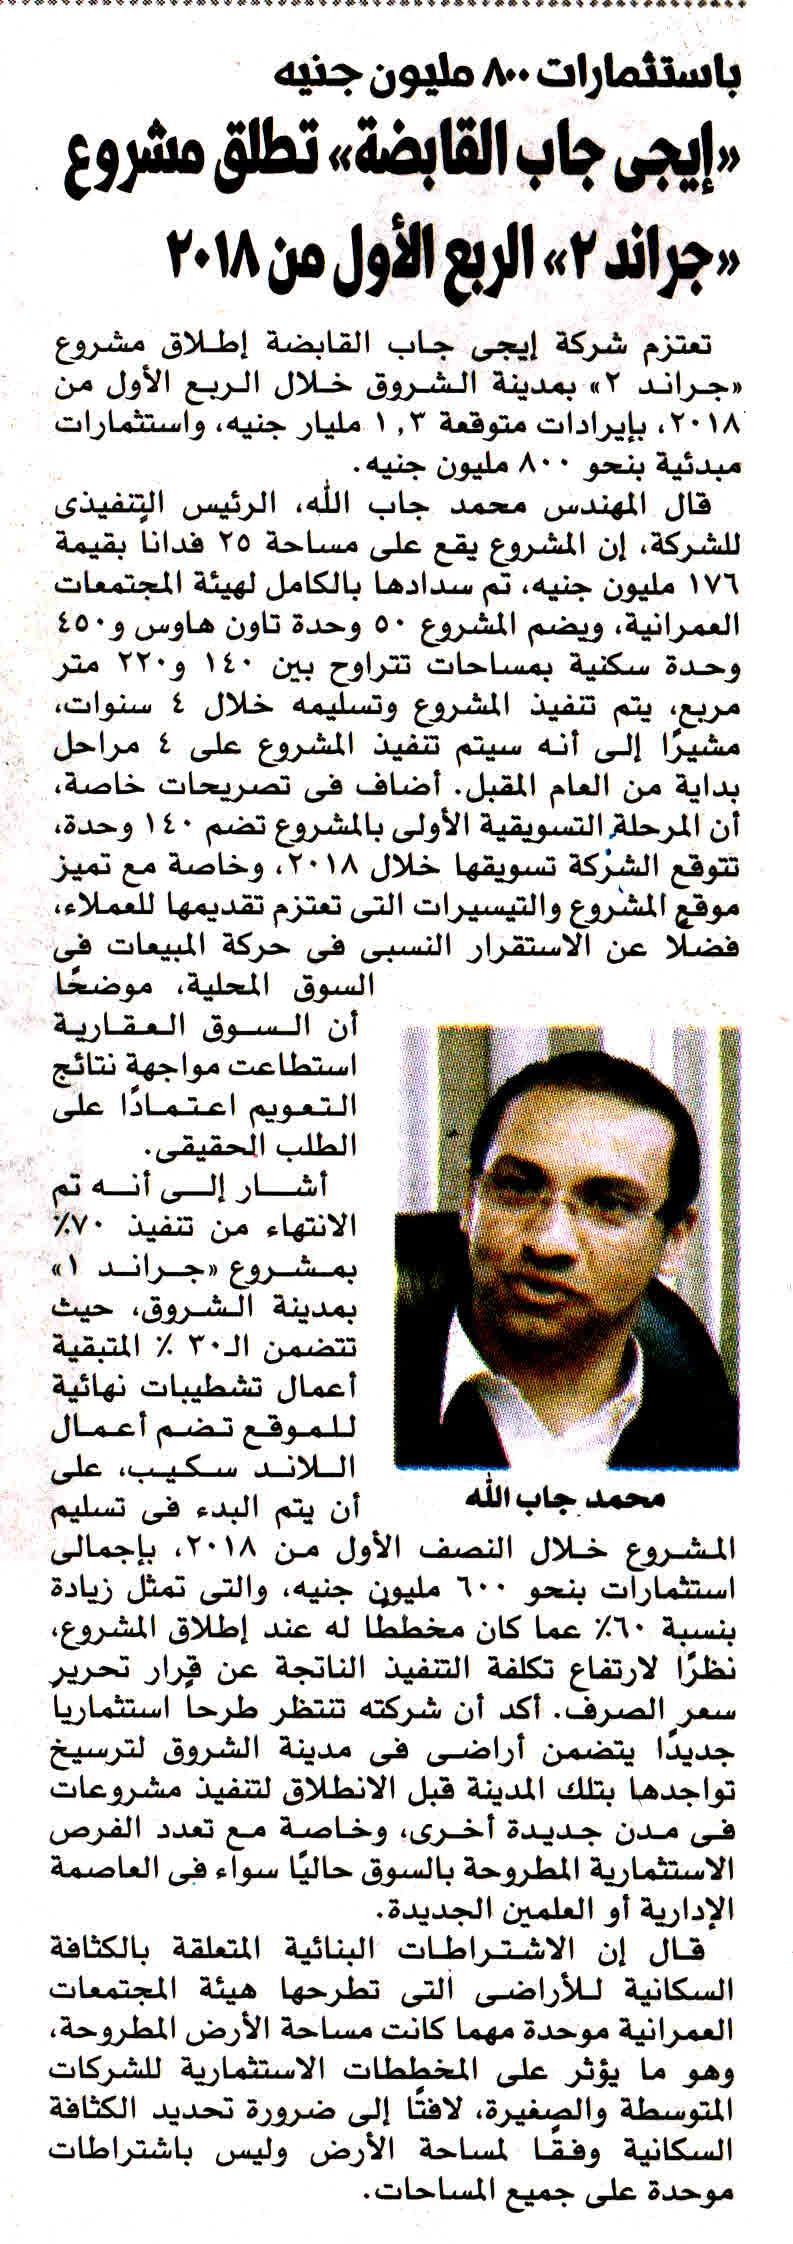 Al Masry Al Youm 3 Nov P.13 A